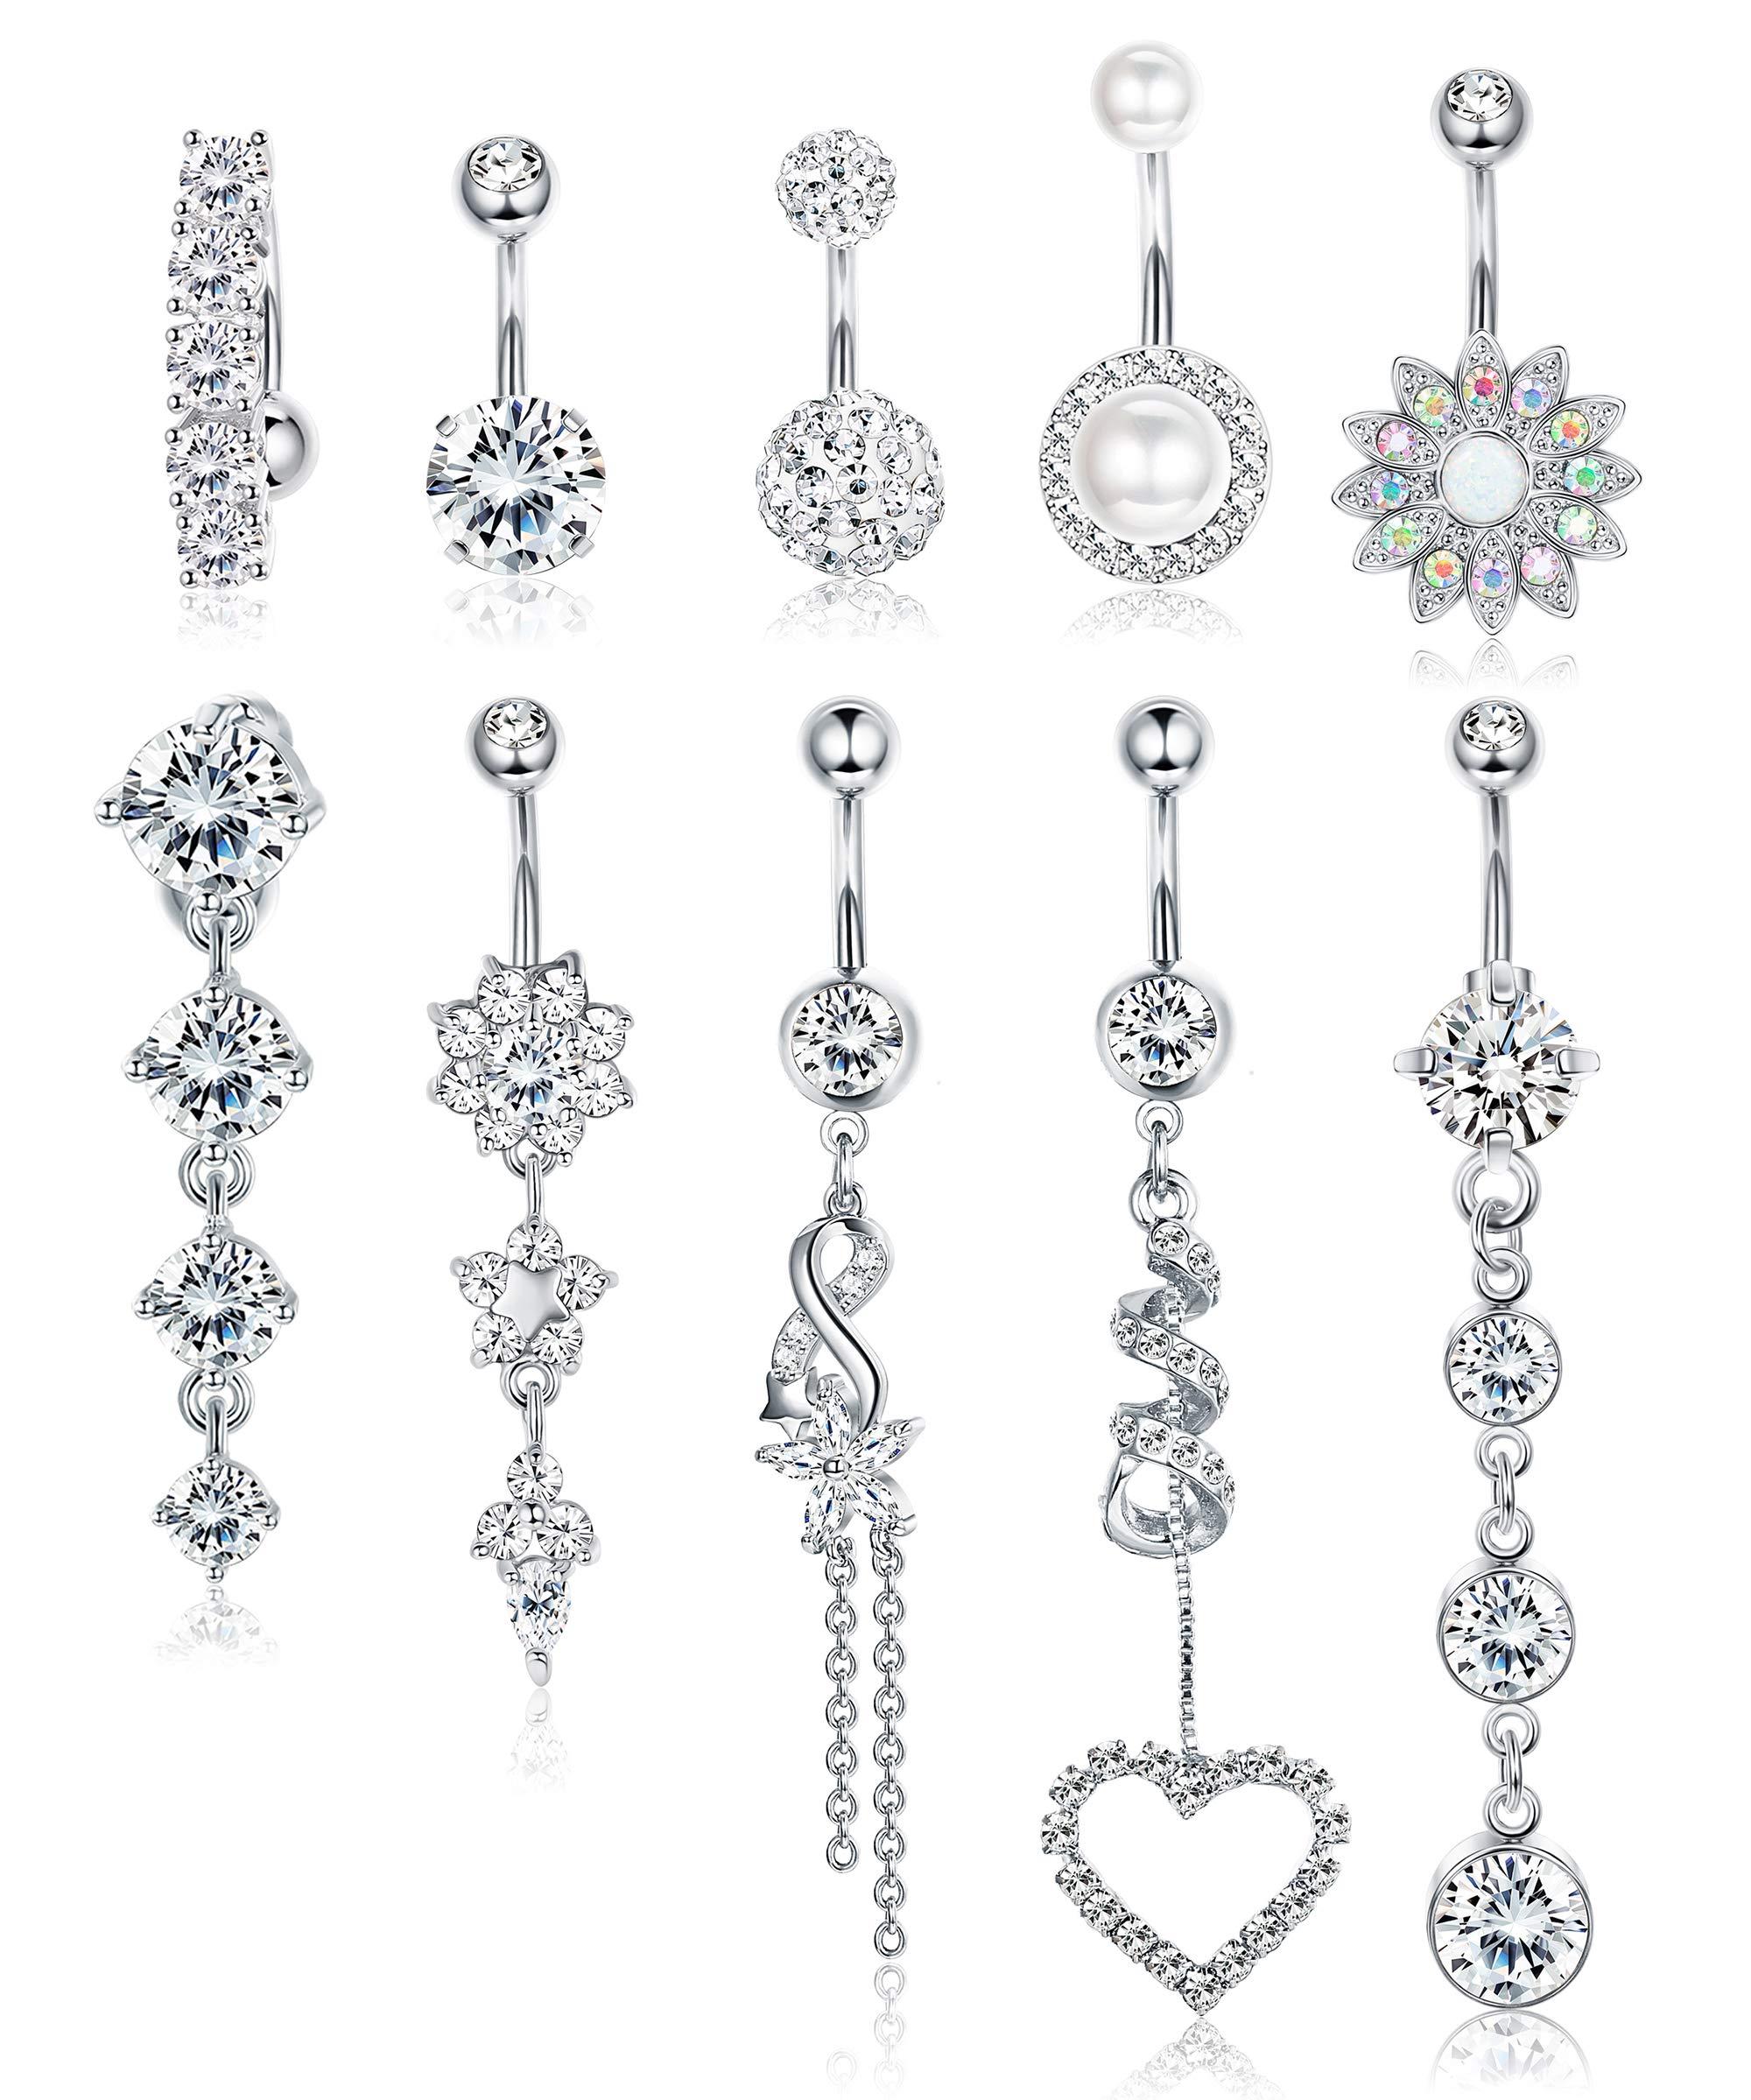 Udalyn 10 PCS Belly Button Rings For Women Girls Navel Rings Surgical Steel 14G Body Jewelry for Women Piercings Belly by Udalyn